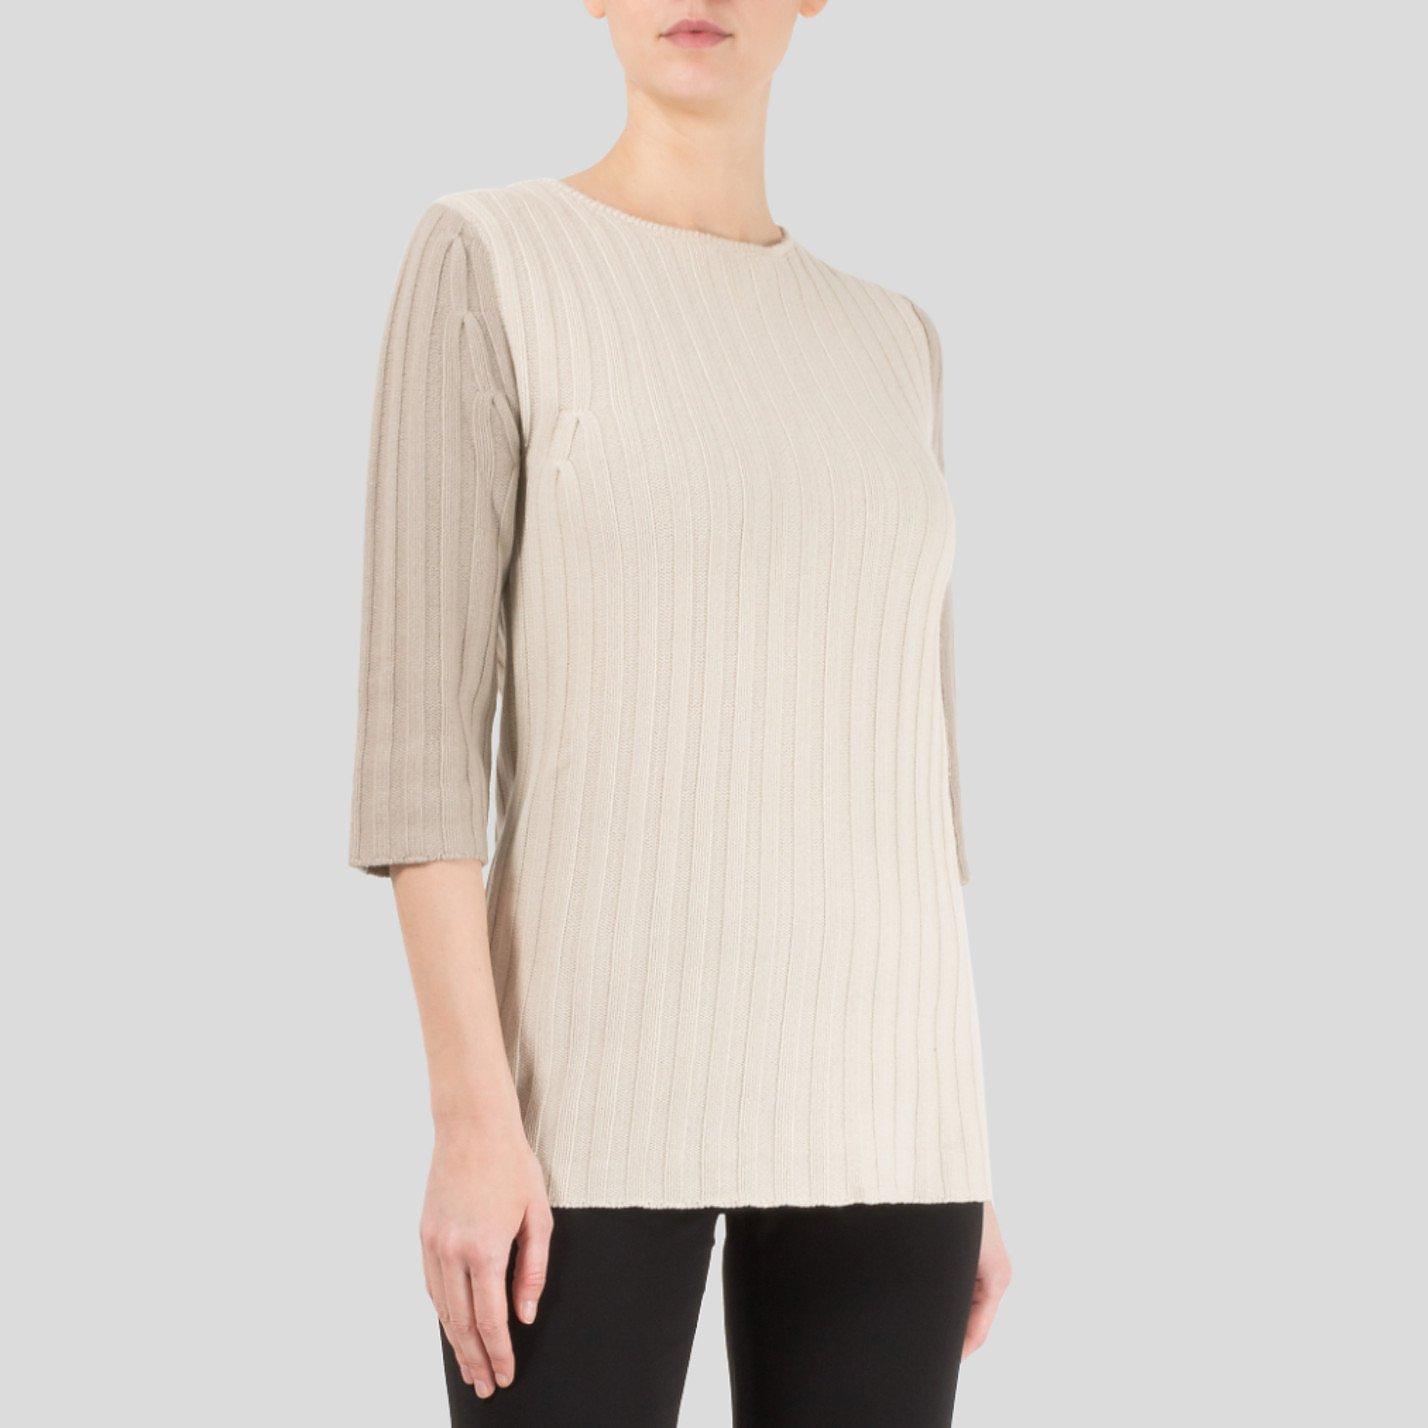 Chloé Contrast Sleeve Sweater